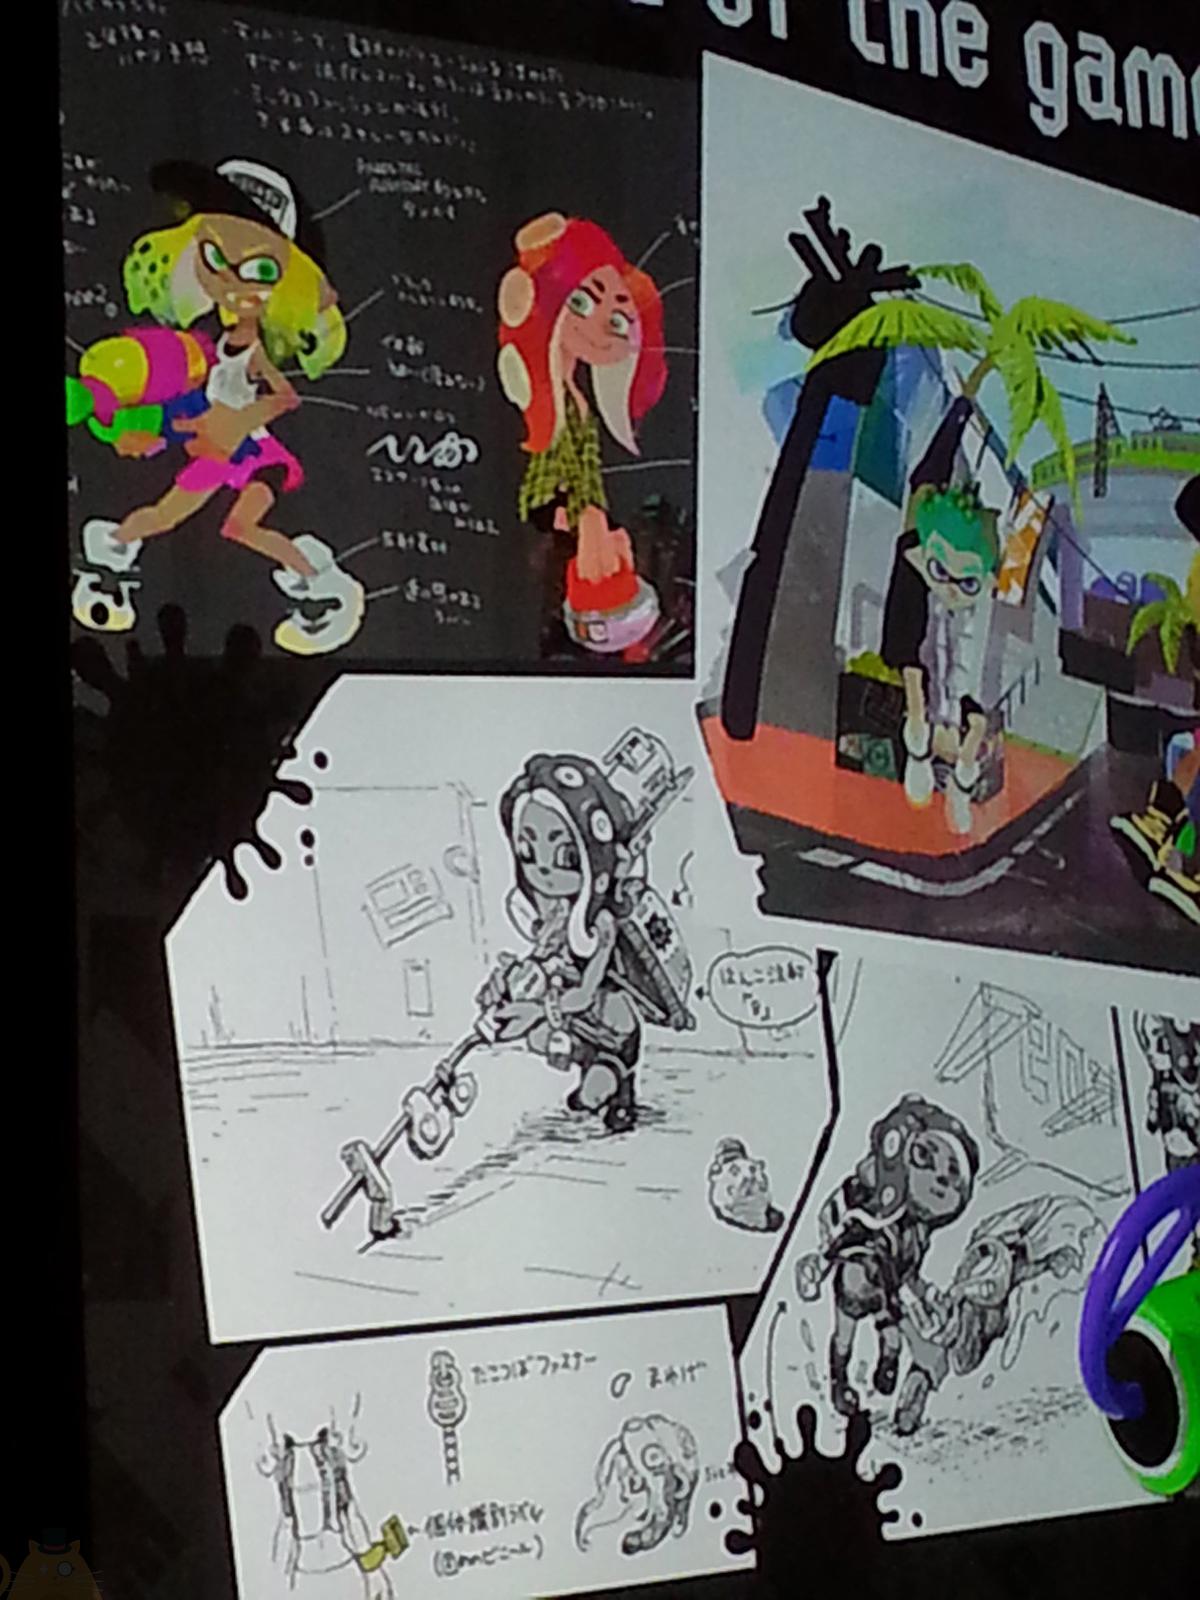 Splatoon Prototypes Concept Art Showcased At Gdc Update